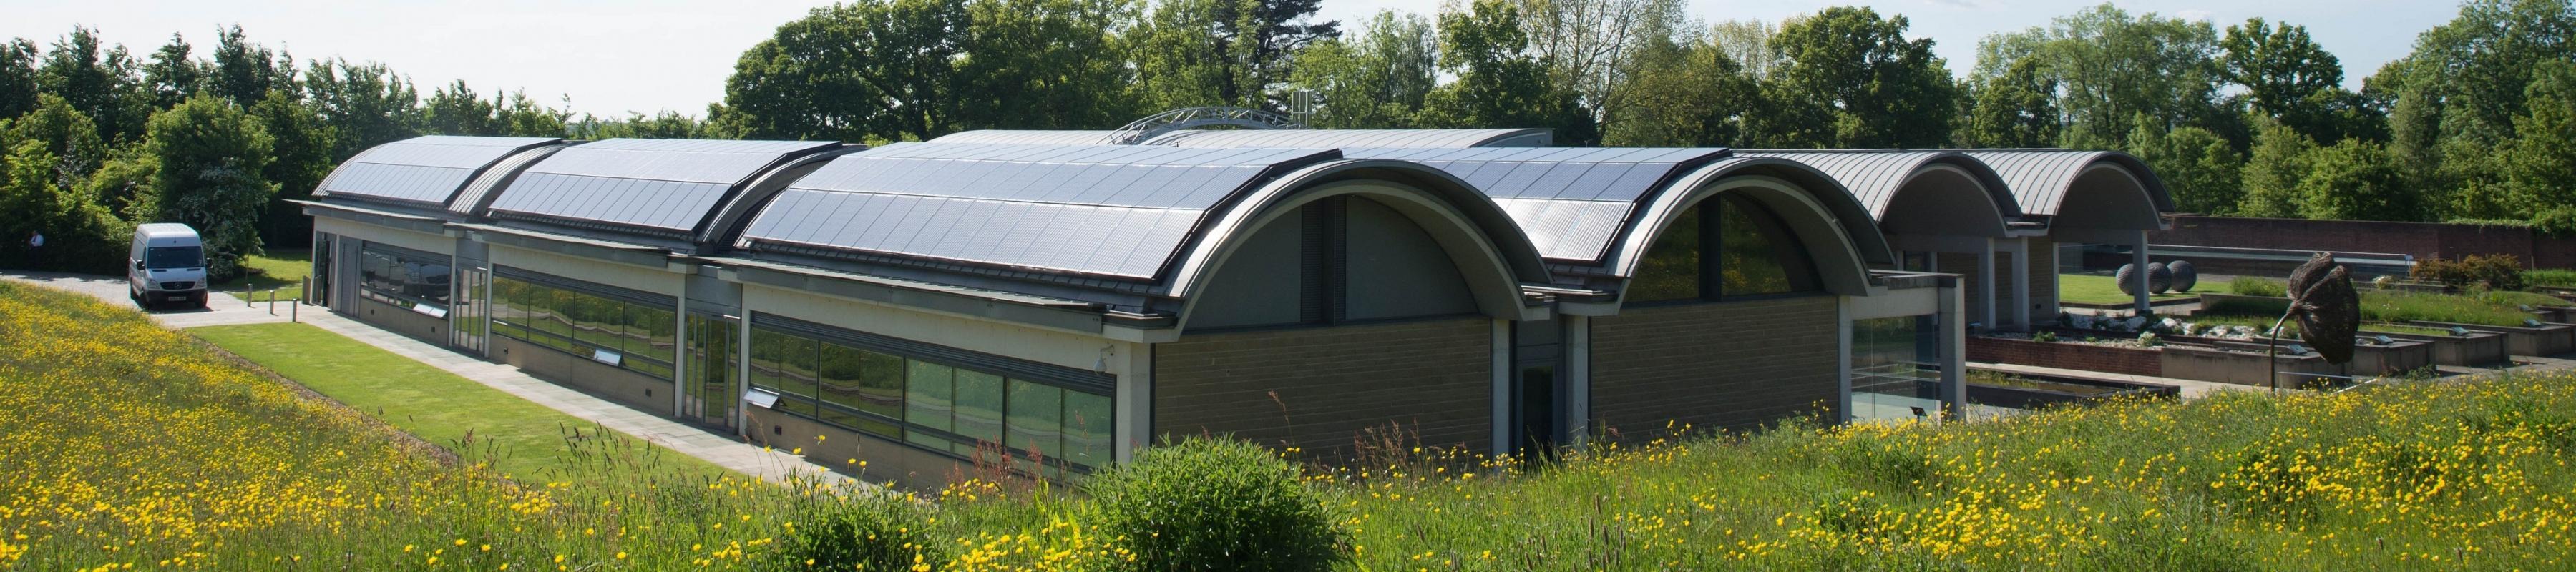 Millennium Seed Bank solar panels